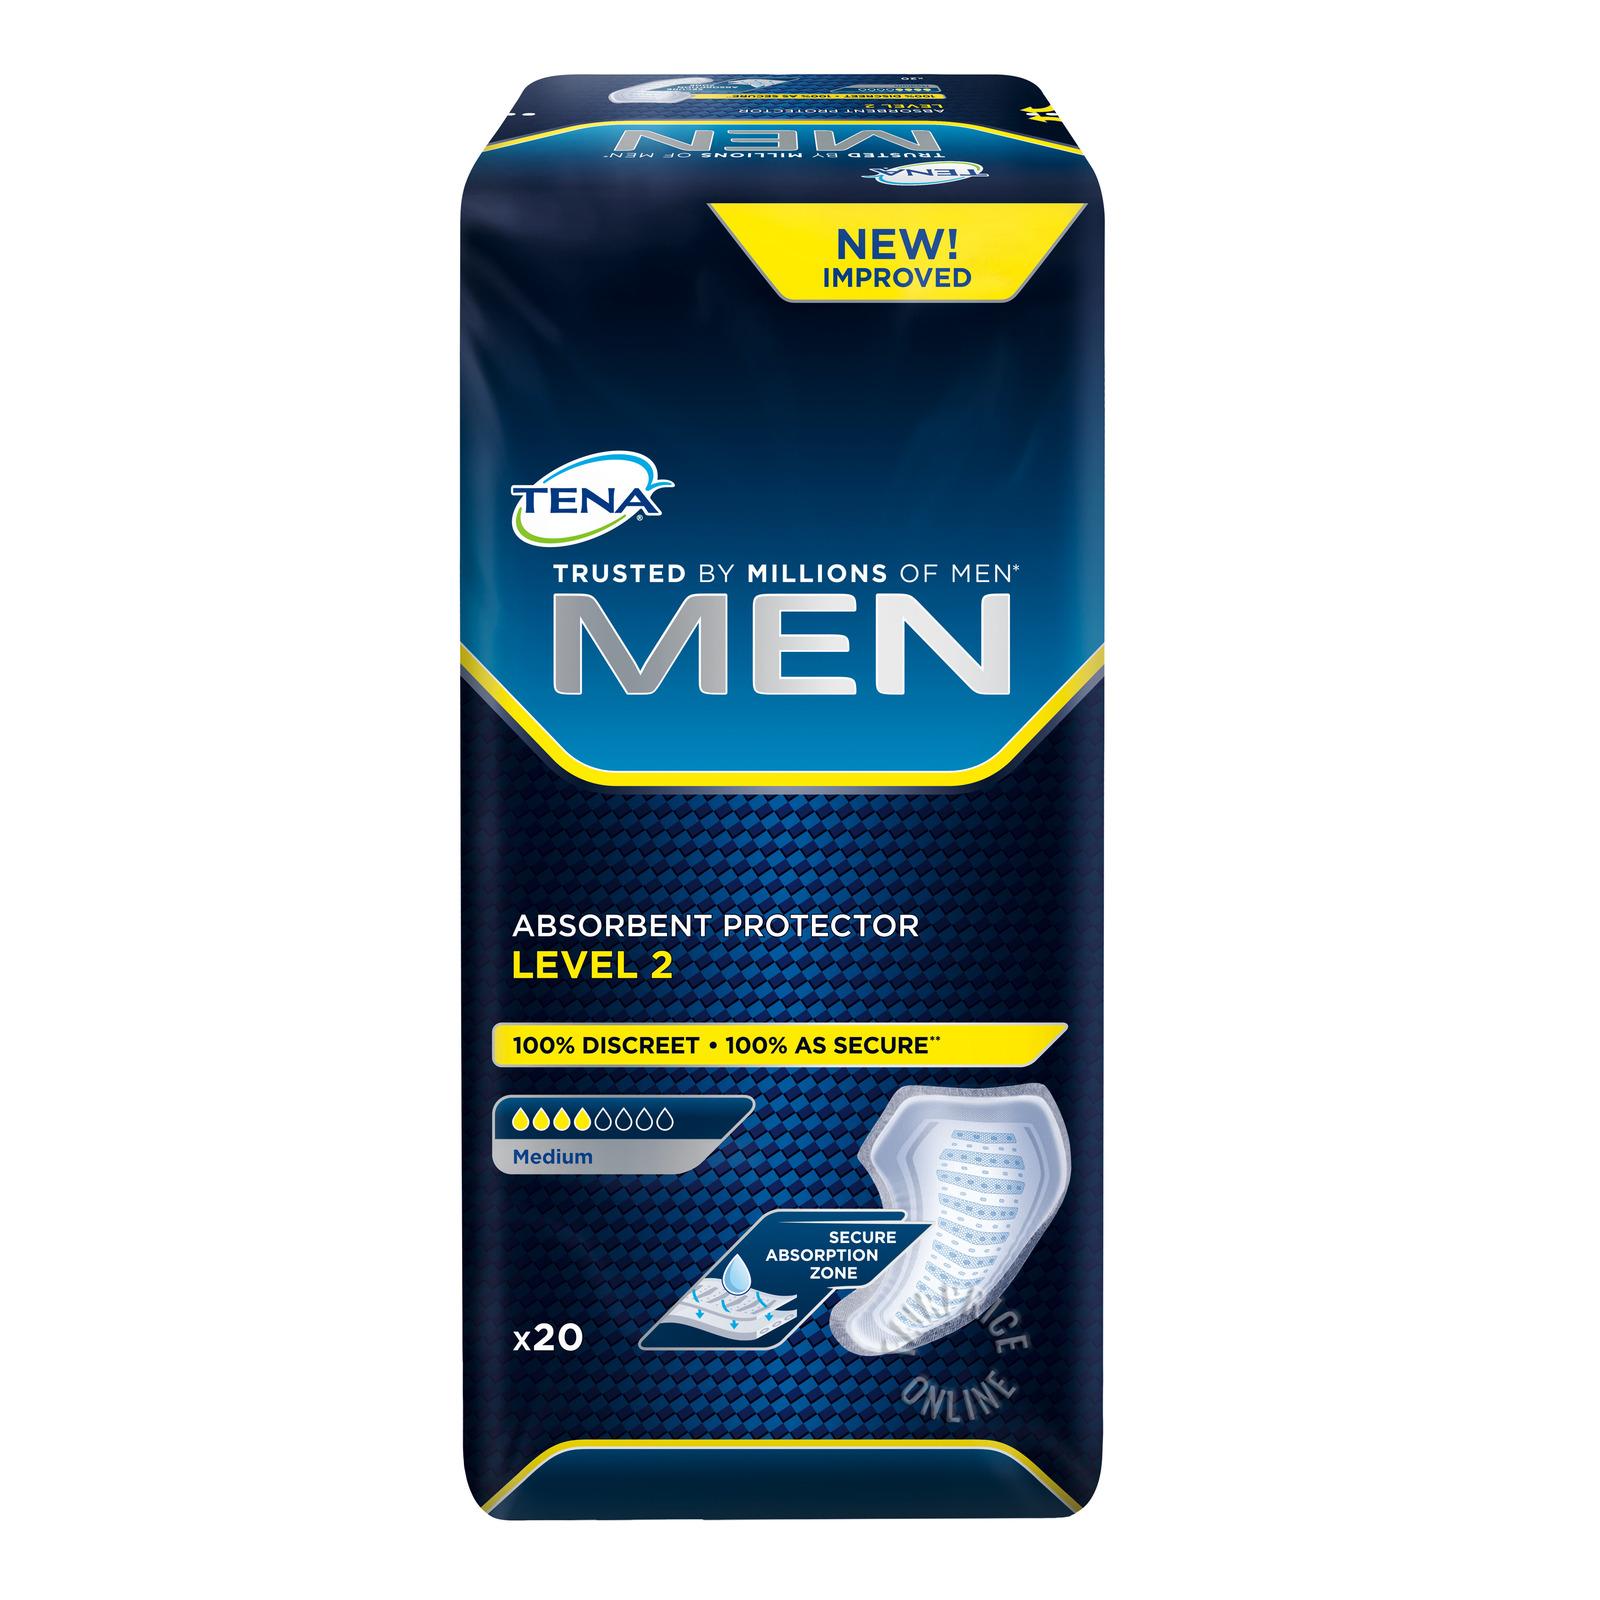 TENA Men Absorbant Protector Pads - Level 2 (M)